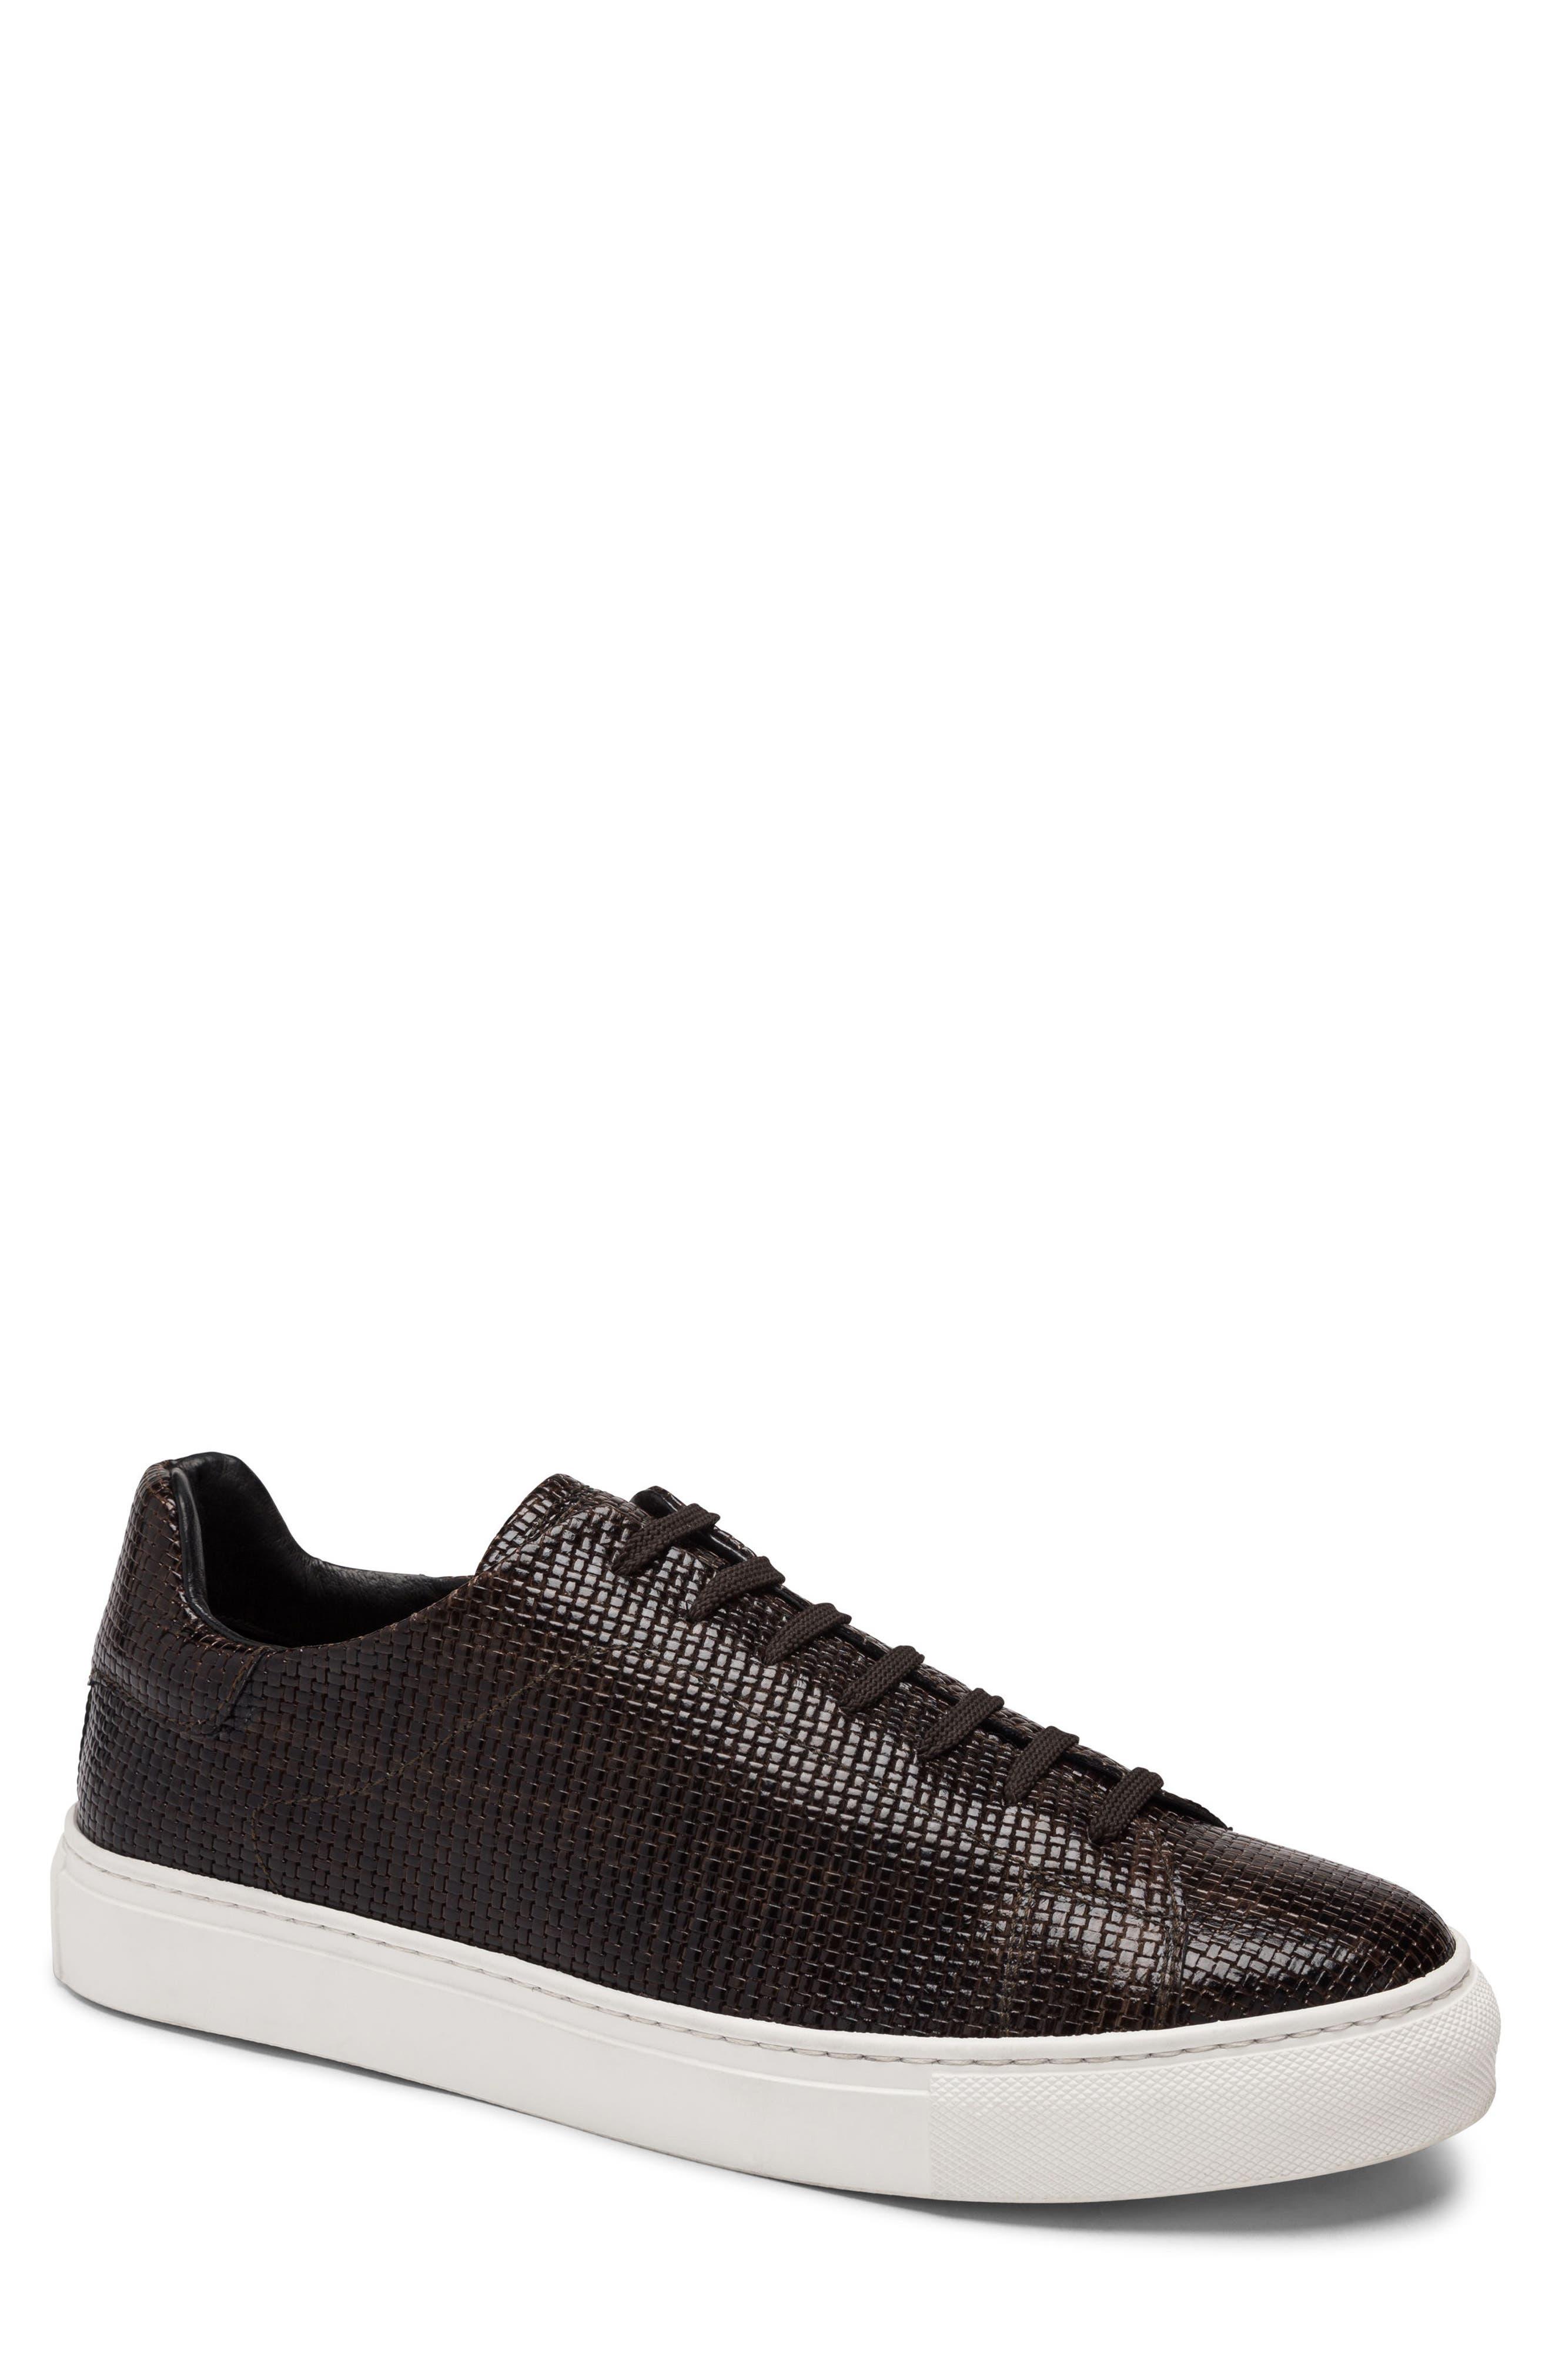 Wimbledon Sneaker,                             Main thumbnail 1, color,                             TESTA DI MORO